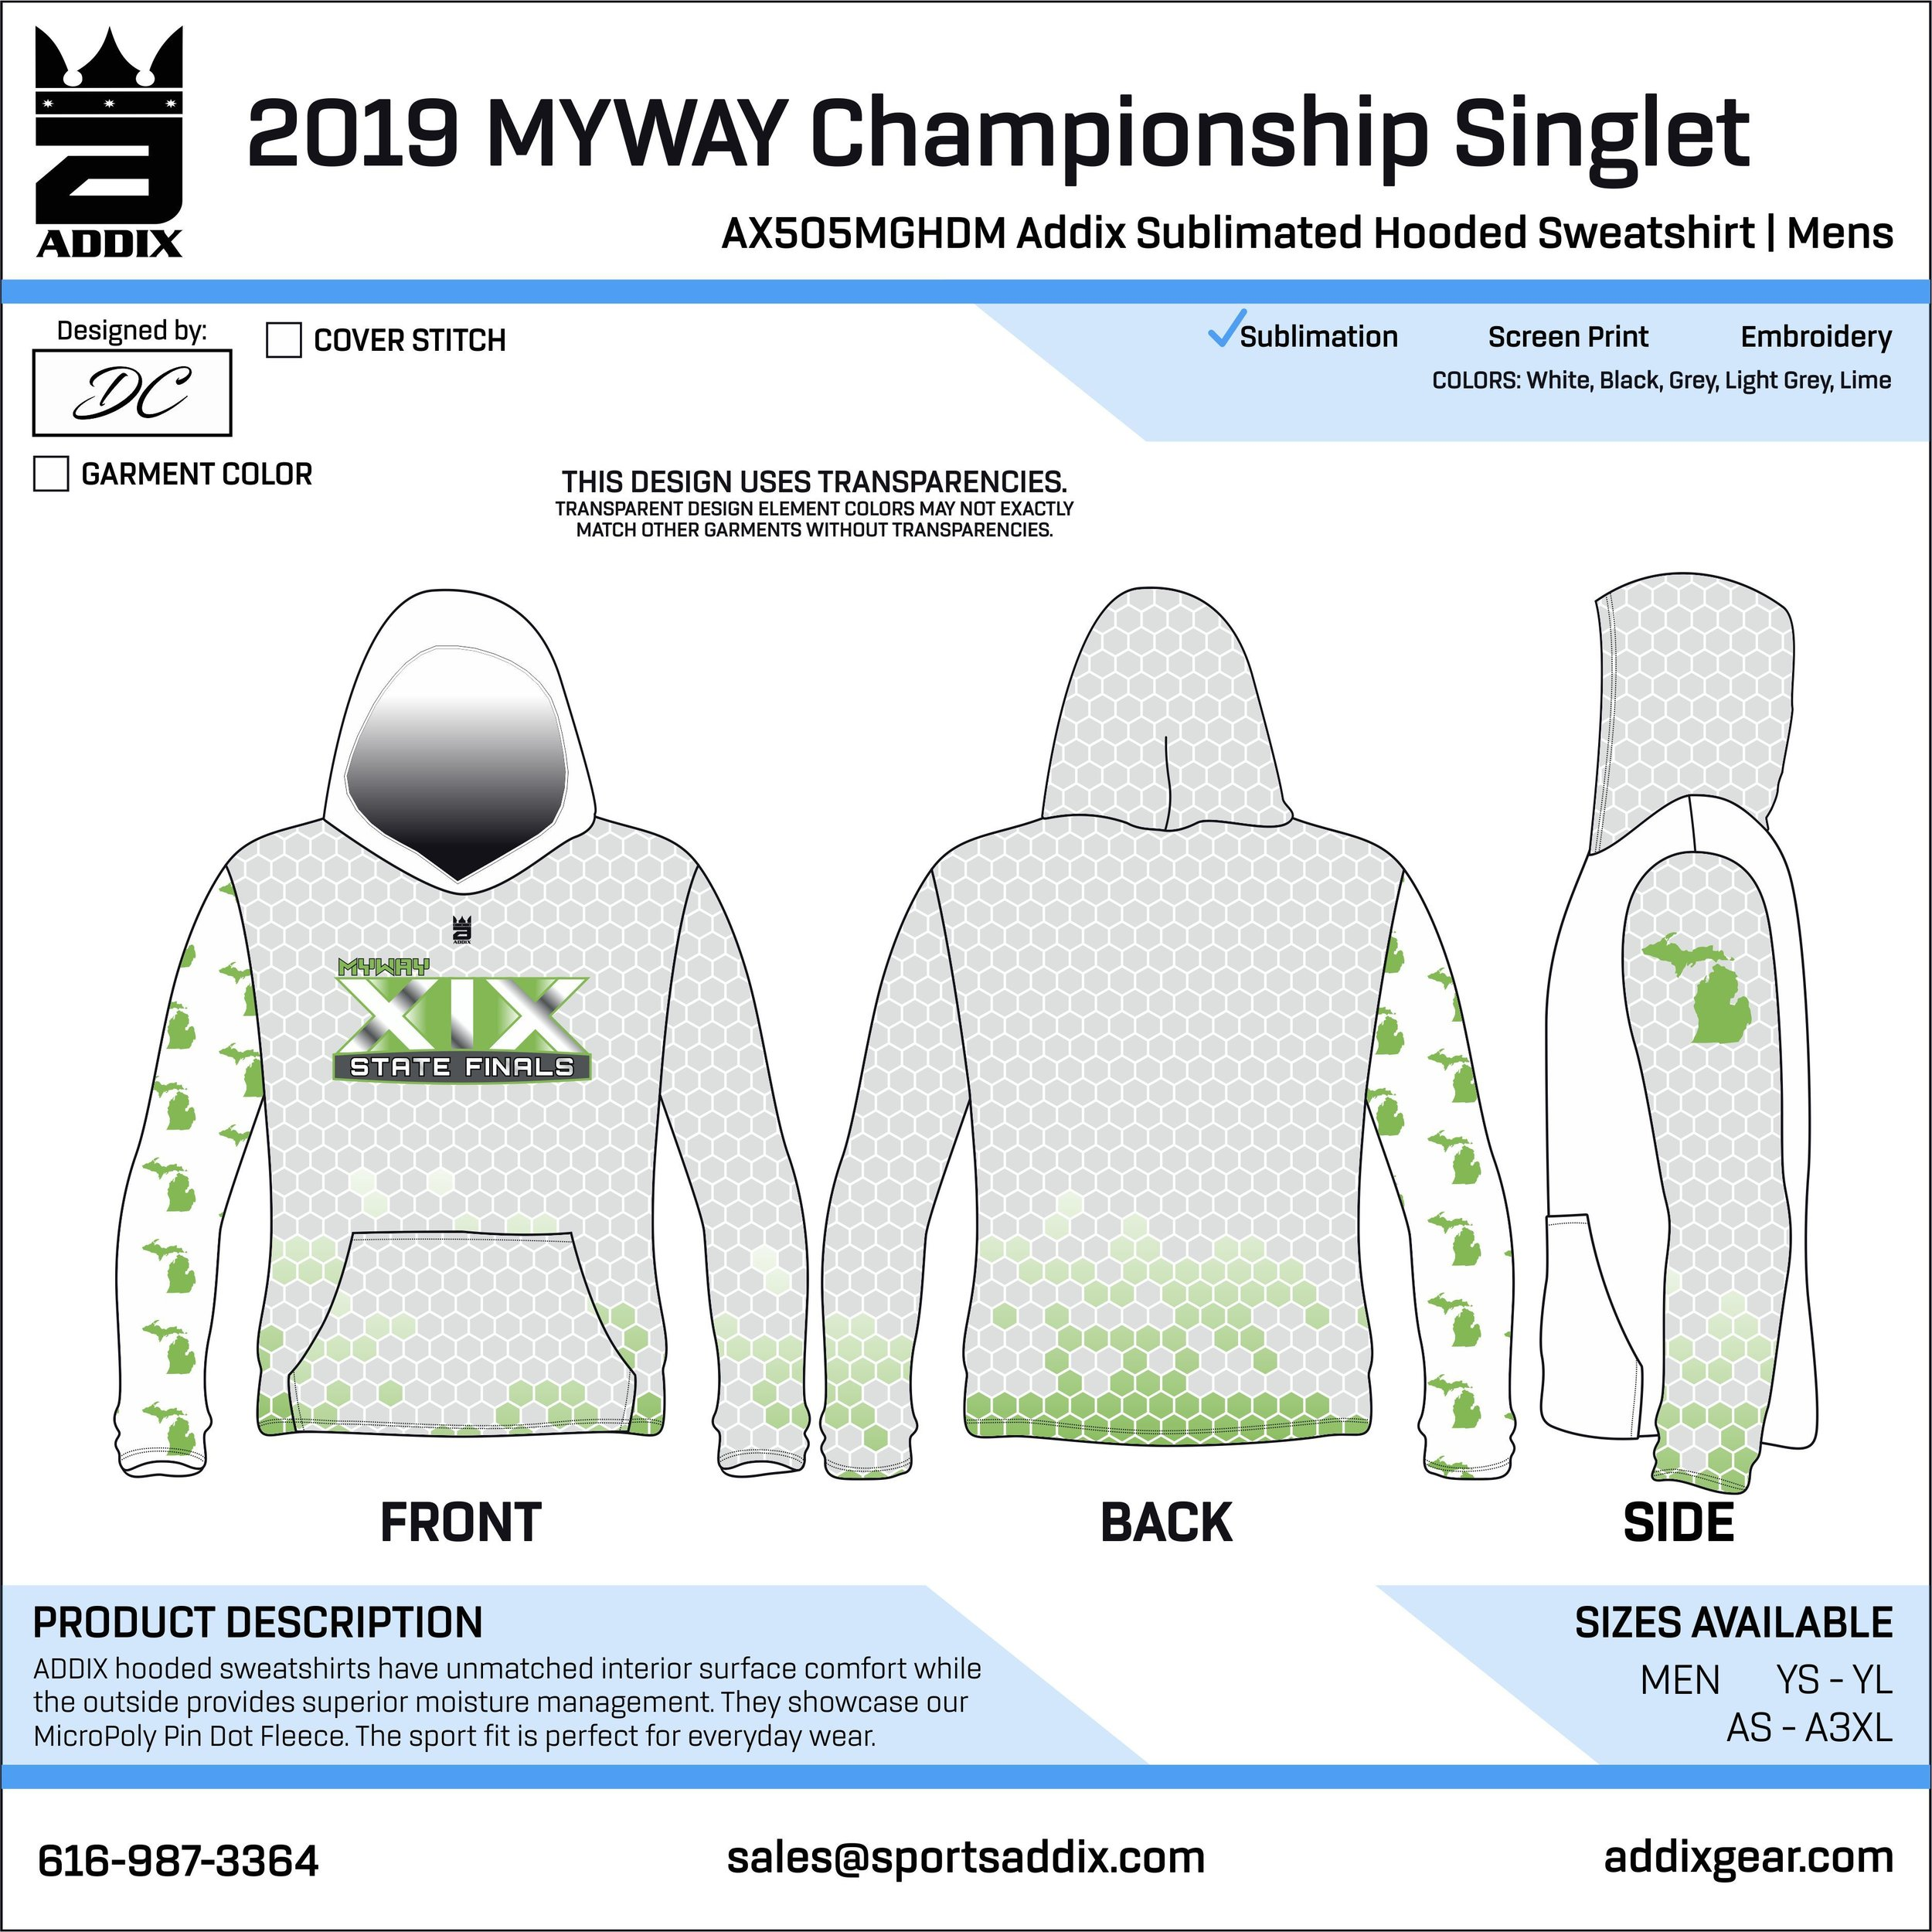 2019 MYWAY Championship Singlet_2019_2-13_DC_FS Hoodie v2.jpg